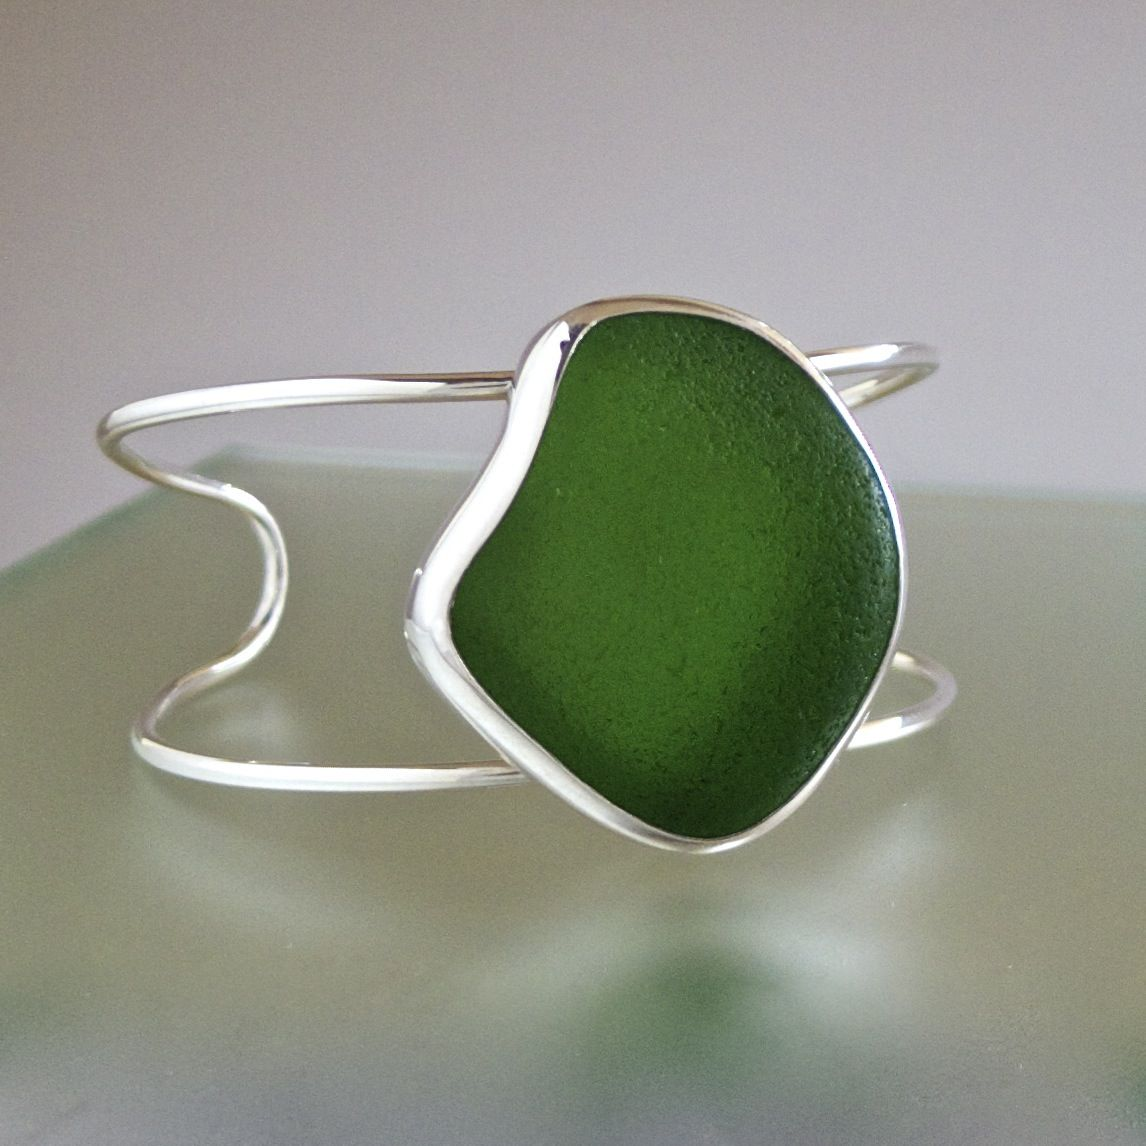 Wholesale sea glass jewelry Emerald green sea glass cuff bracelet